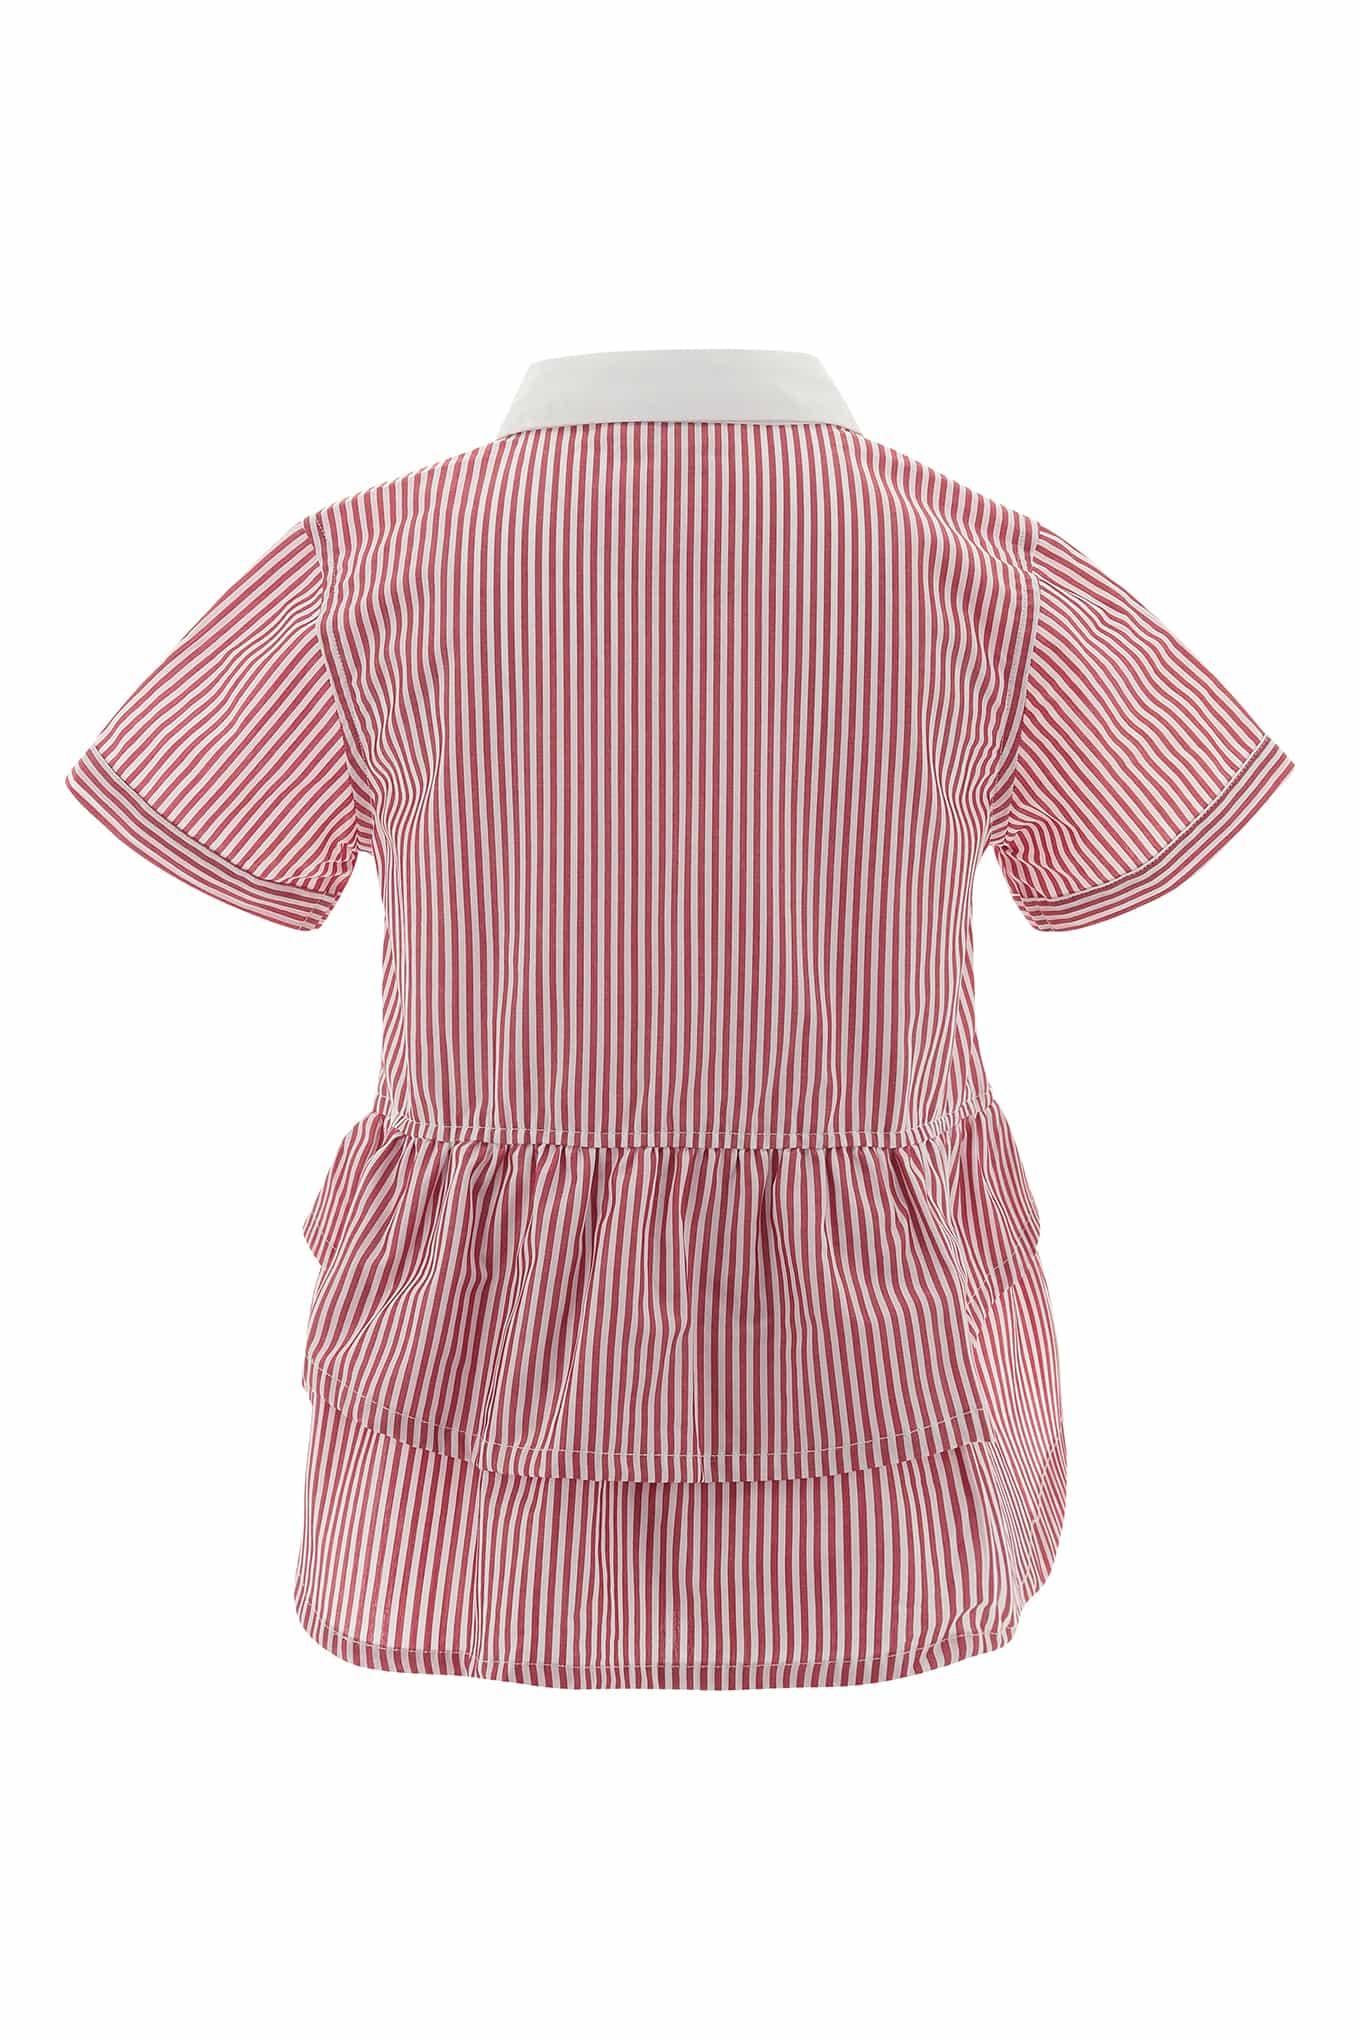 Camisa Vermelho Casual Rapariga